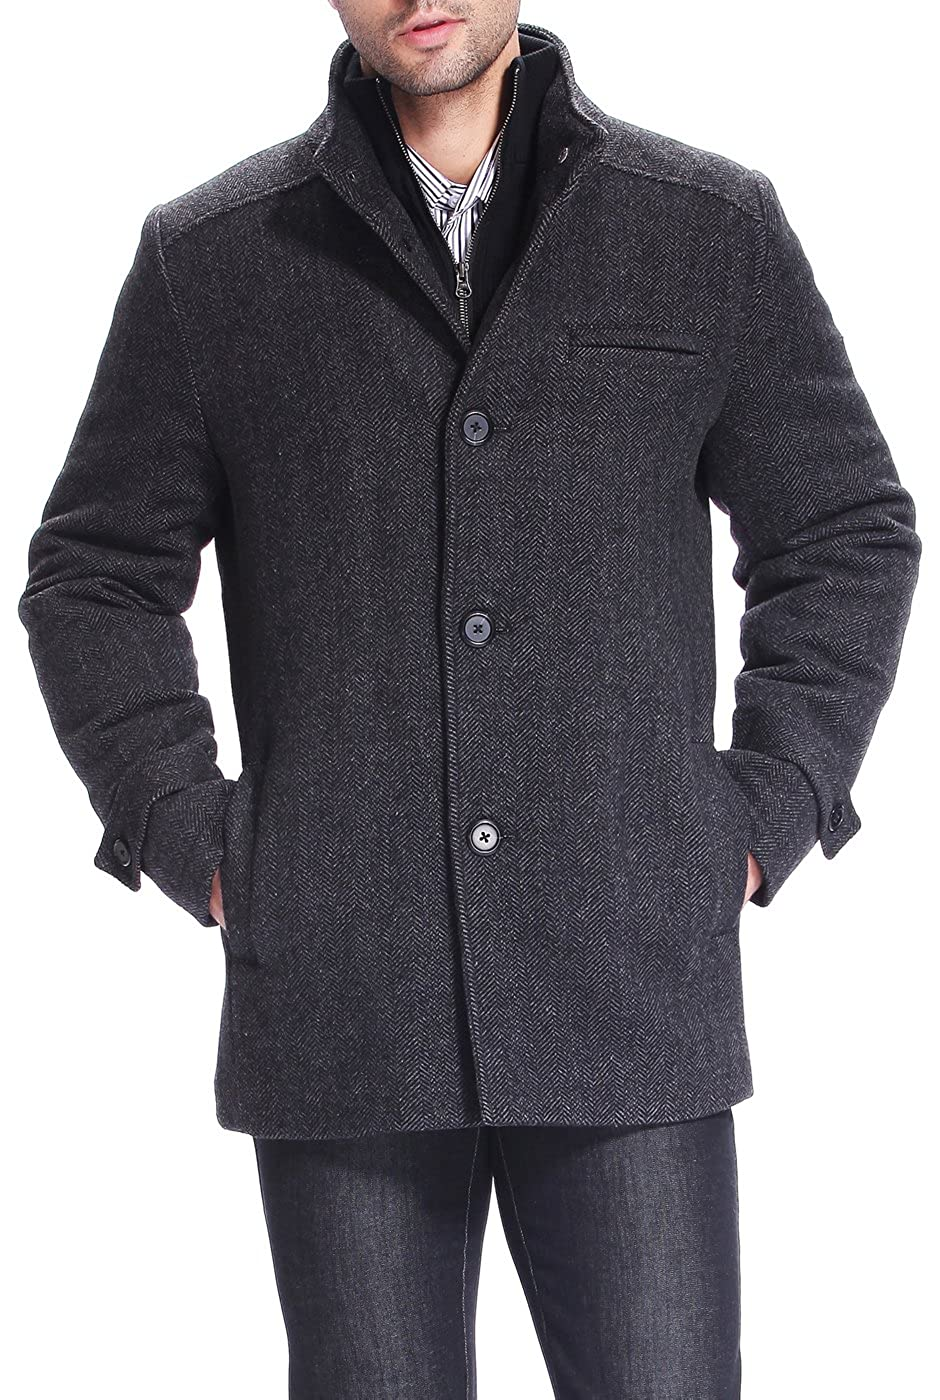 BGSD Men's 'Samuel' Herringbone Wool Blend Bibbed Car Coat